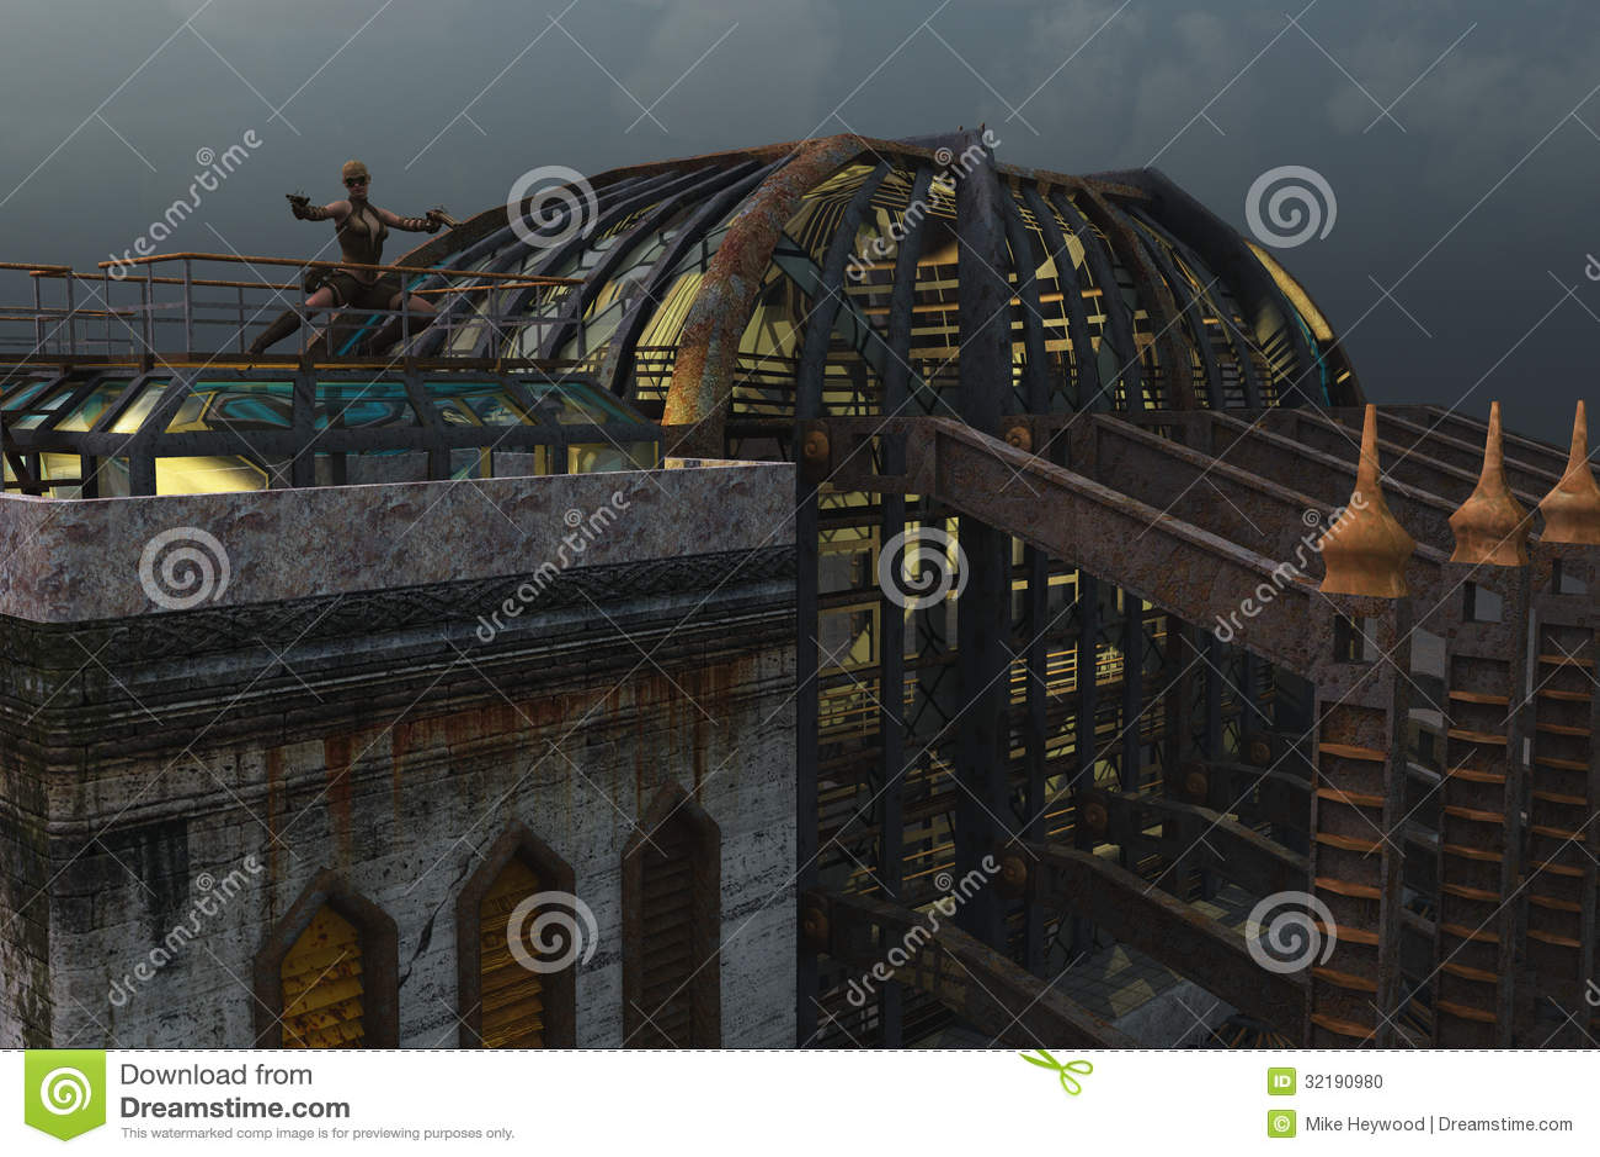 Steel Church Building Plans